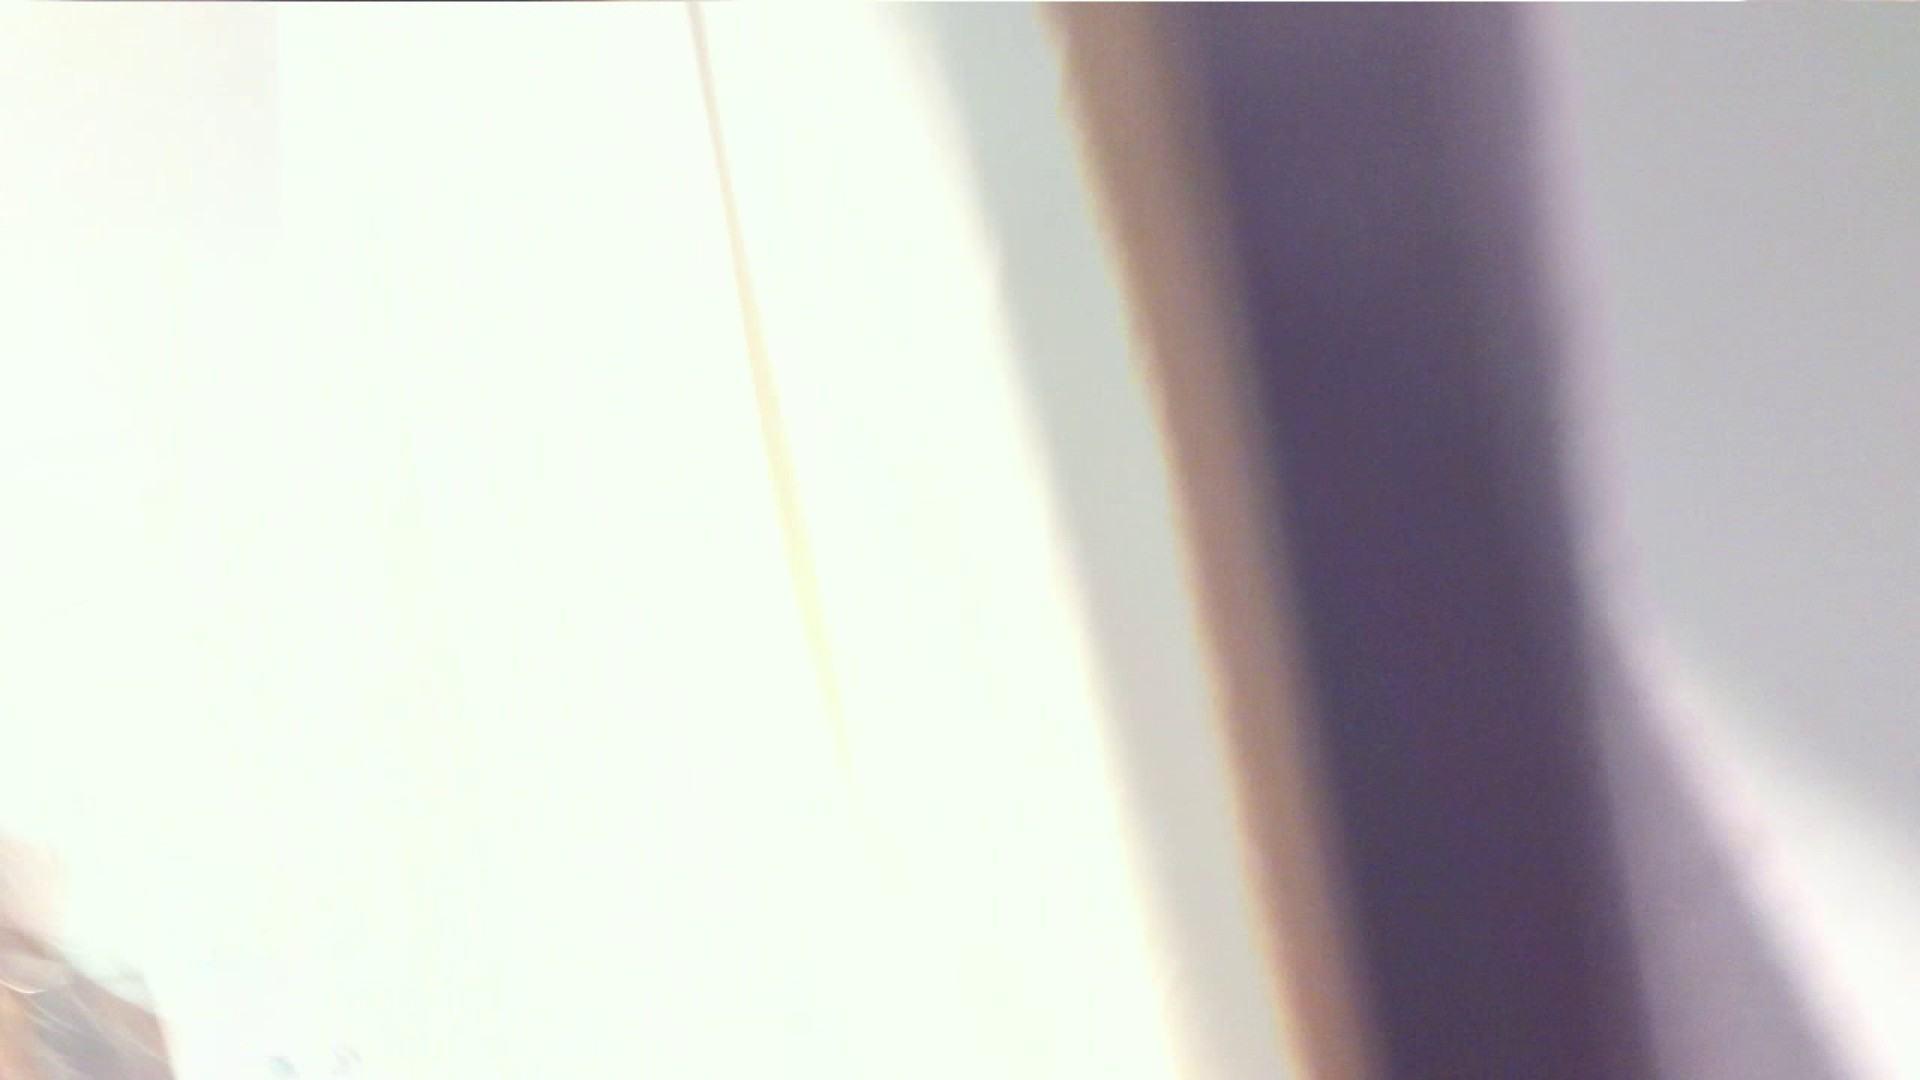 vol.33 美人アパレル胸チラ&パンチラ ギャル系ネーチャンの下着 チラ 盗撮オマンコ無修正動画無料 42pic 27